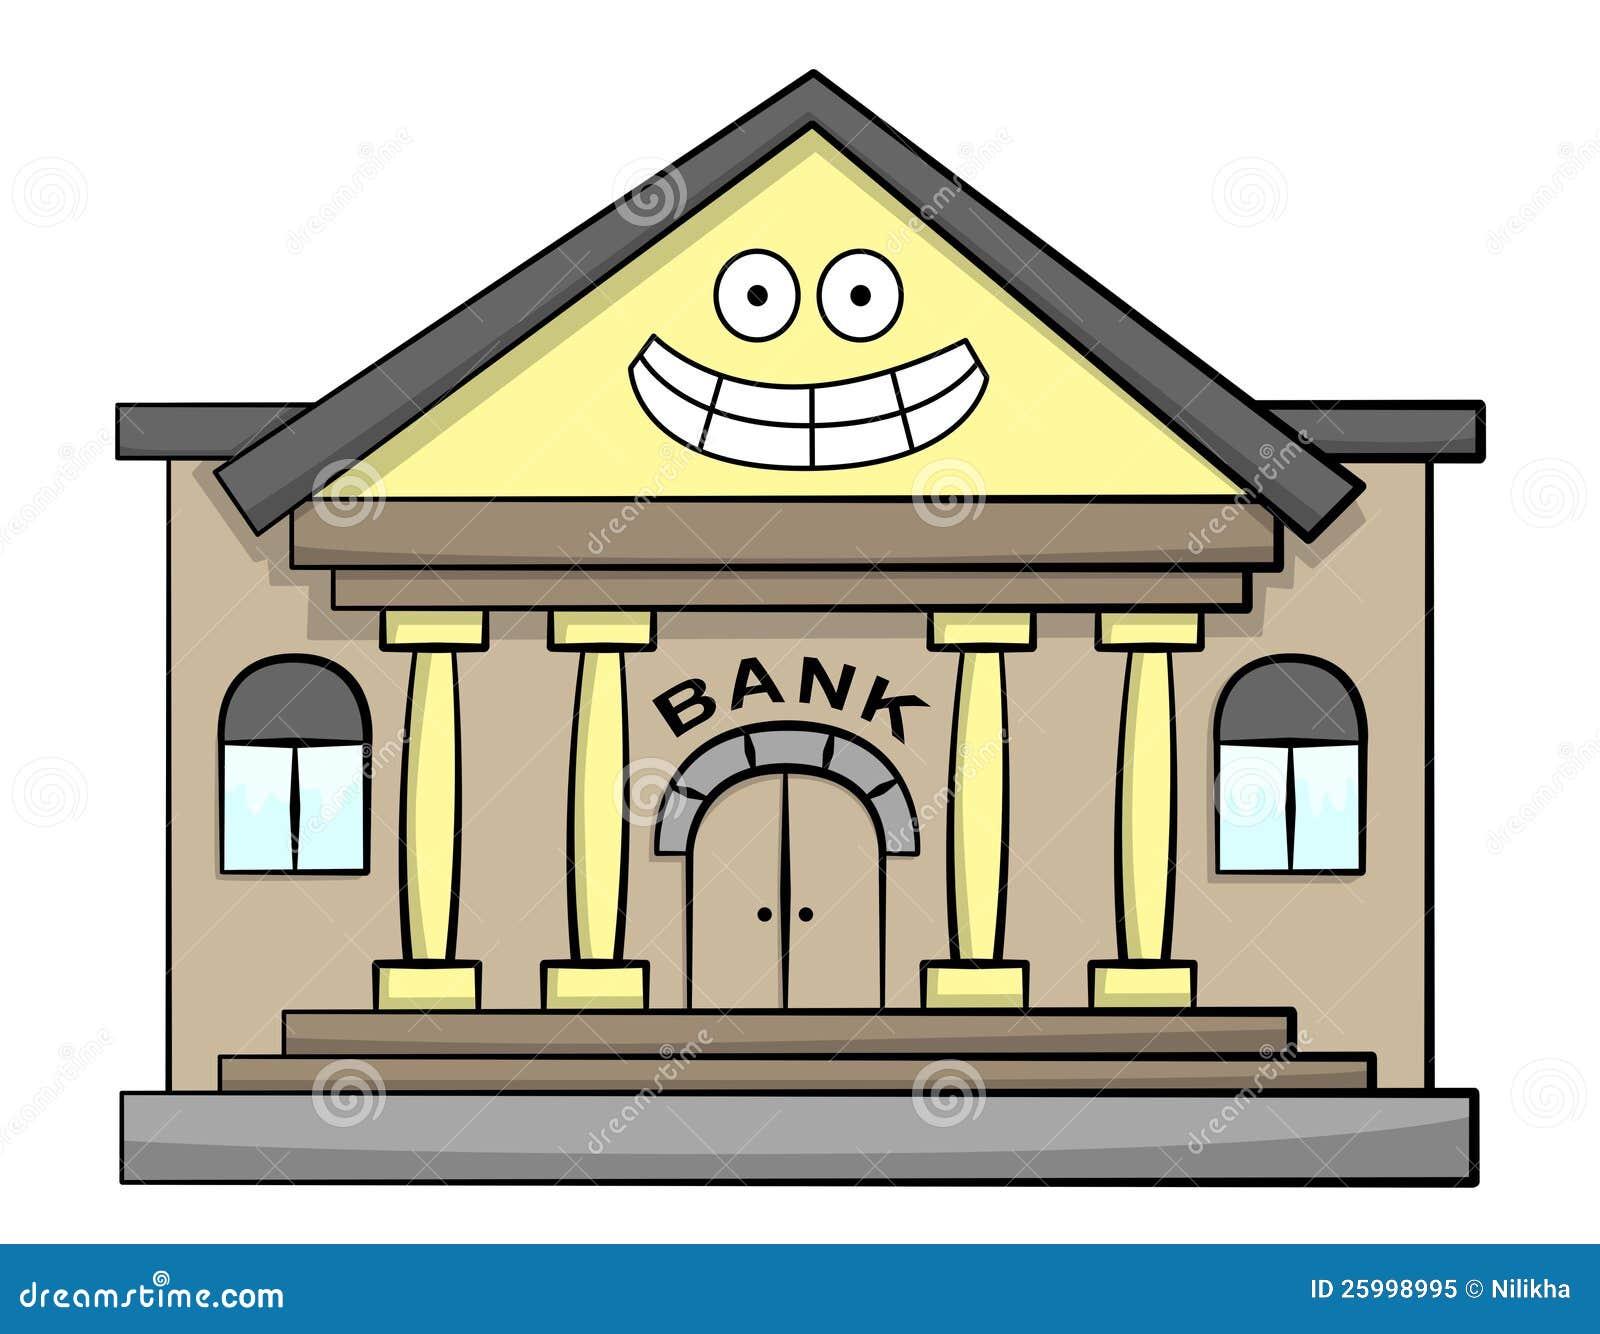 bank building clip art - photo #21